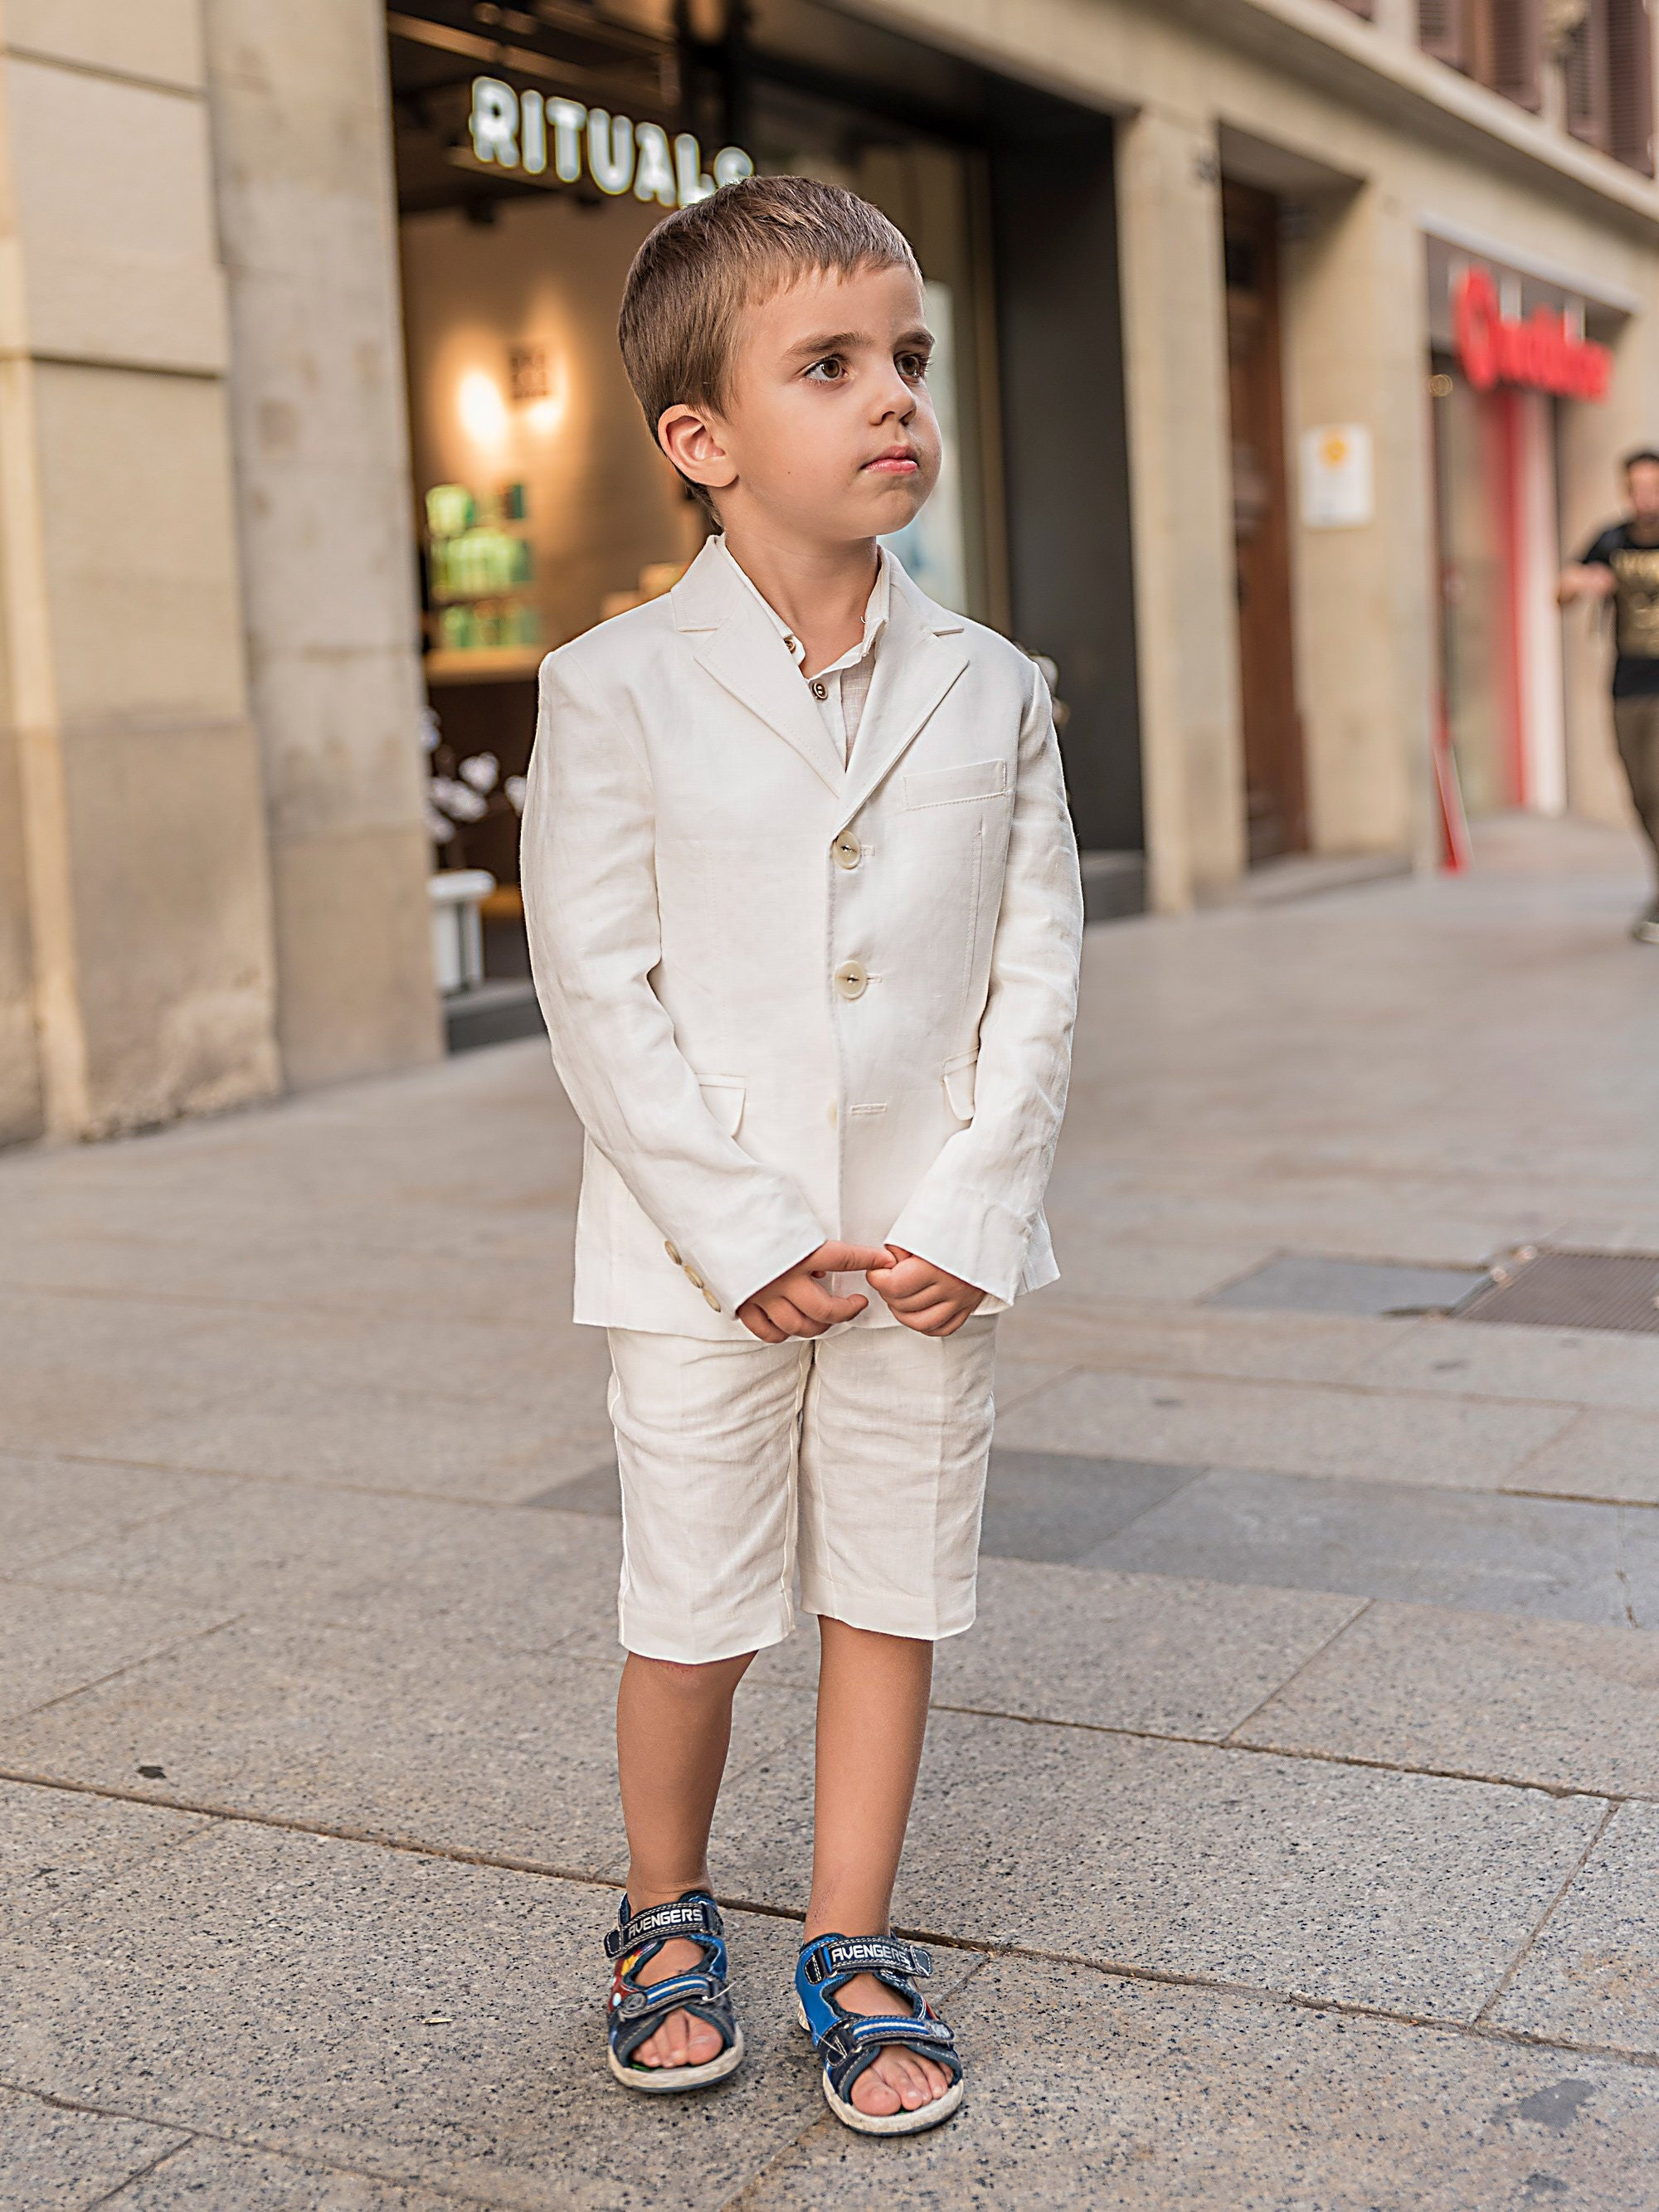 ef2cb94faef68 Boys linen suit summer formal wear kids linen outfit/ Communion toddler boy  linen suit set/ Kid boy wedding tuxedo outfits linen dress suits